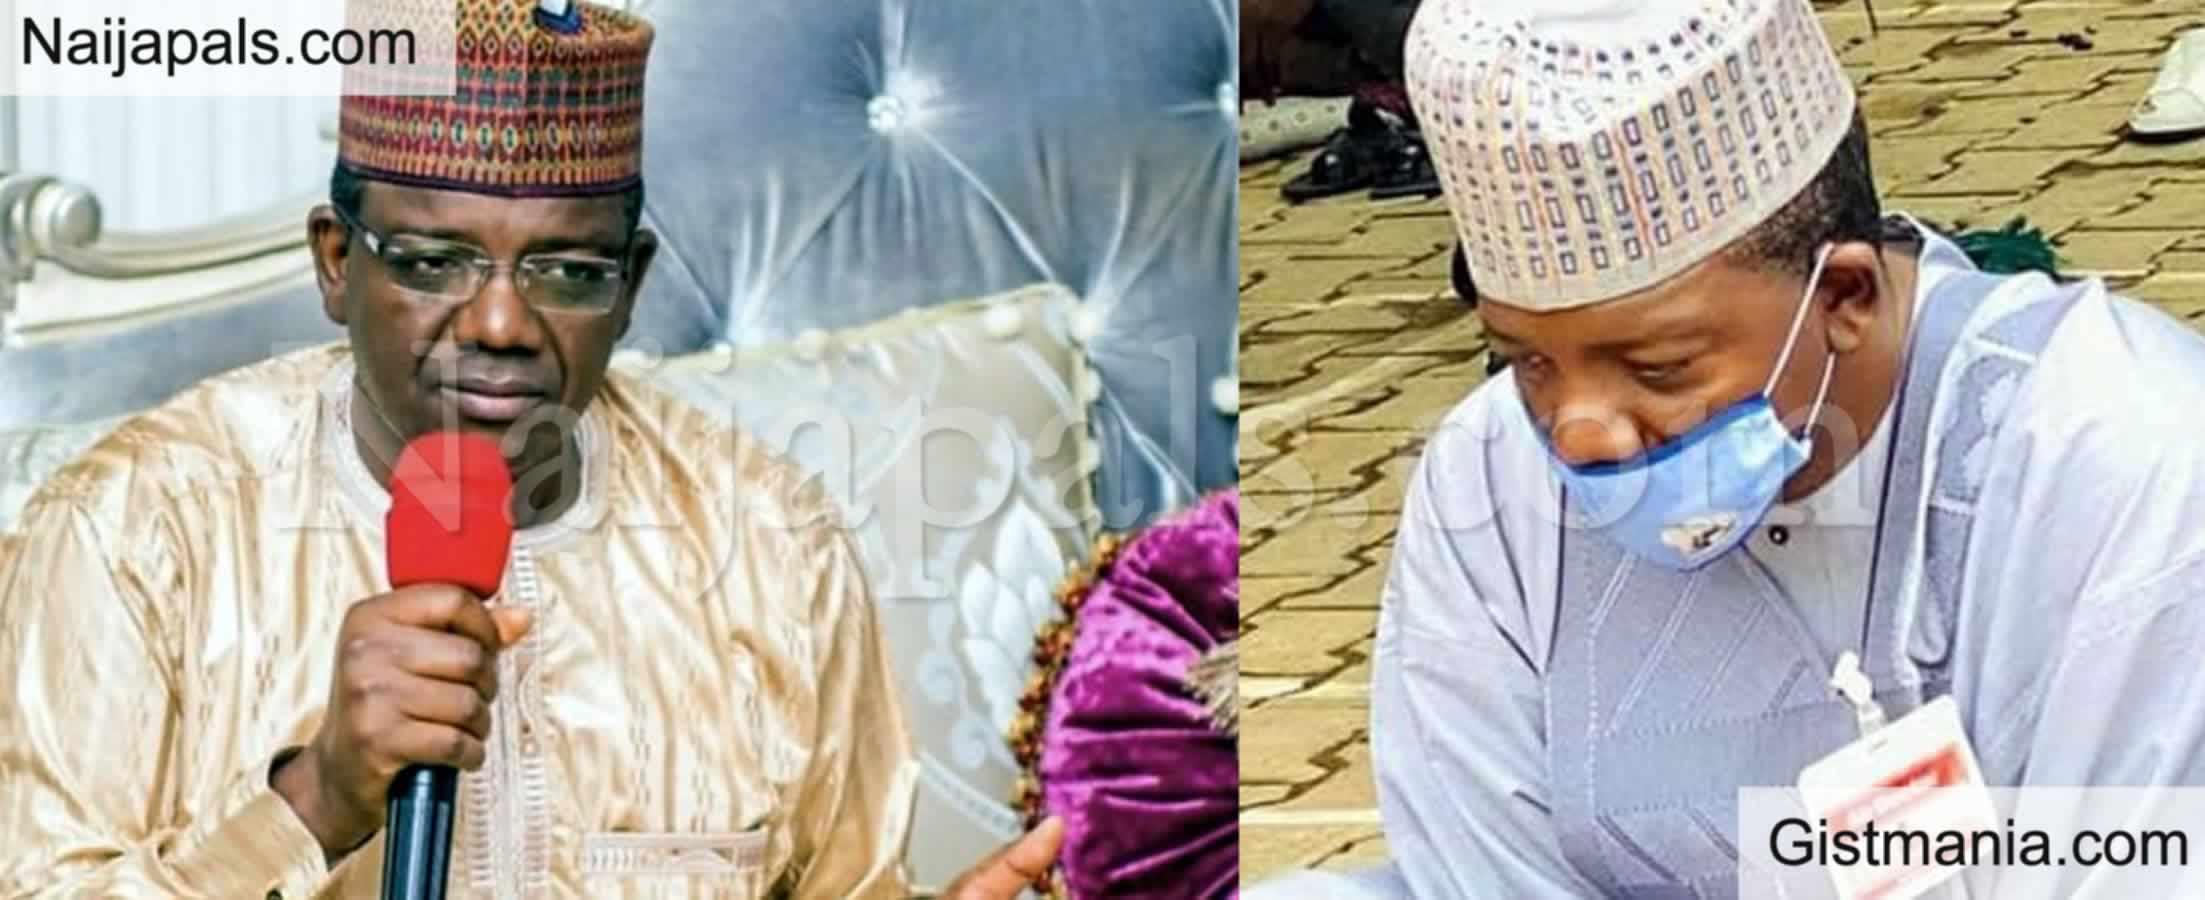 <img alt='.' class='lazyload' data-src='https://img.gistmania.com/emot/grin.gif' /> <b>Zamfara State Government Spends ₦2.9bn On Ramadan Welfare</b>